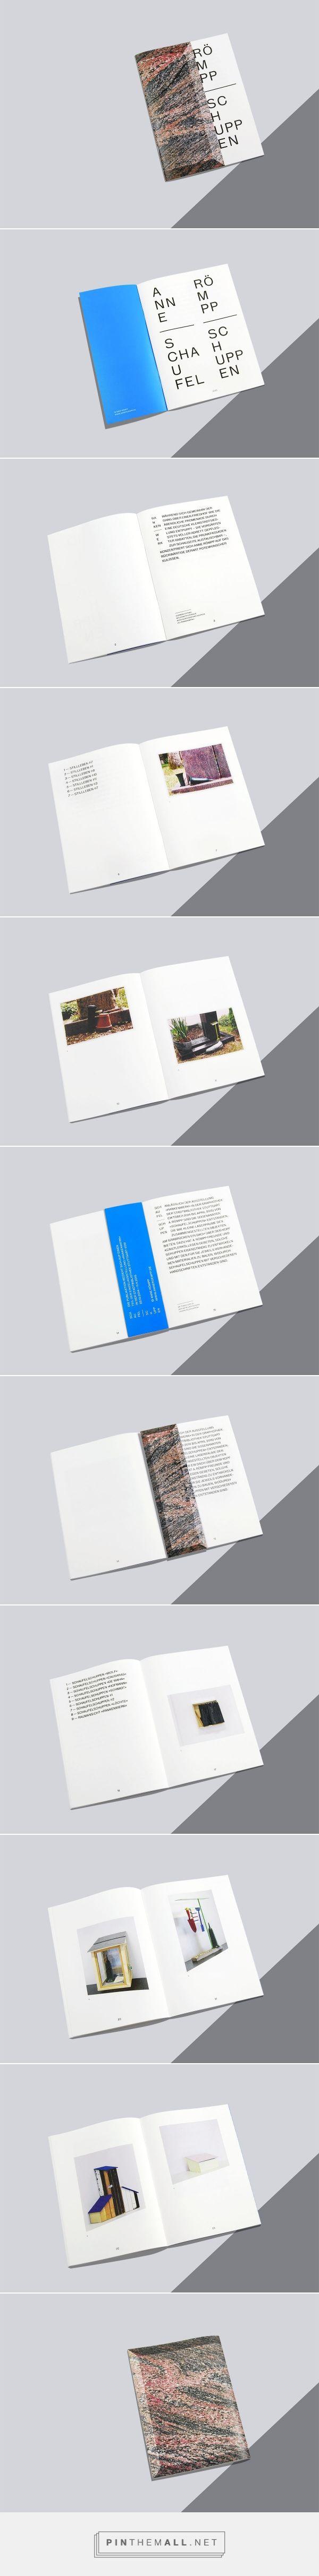 Bureau Progressiv visuelle Kommunikation... - a grouped images picture - Pin Them All